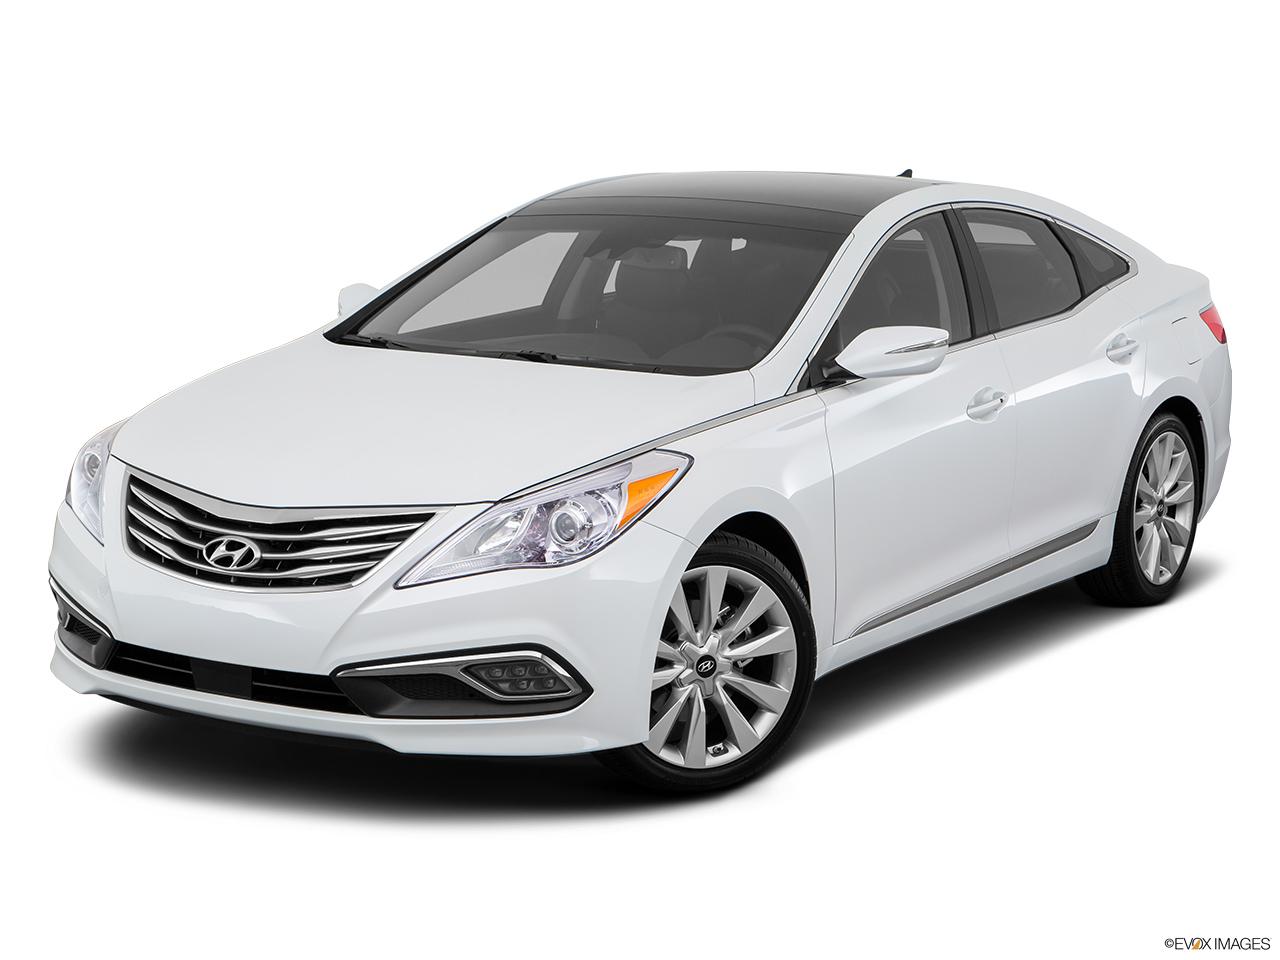 Mazda3 Vs Hyundai Elantra >> Hyundai Elantra Vs Mazda 3 | Best Car Reviews 2019 2020